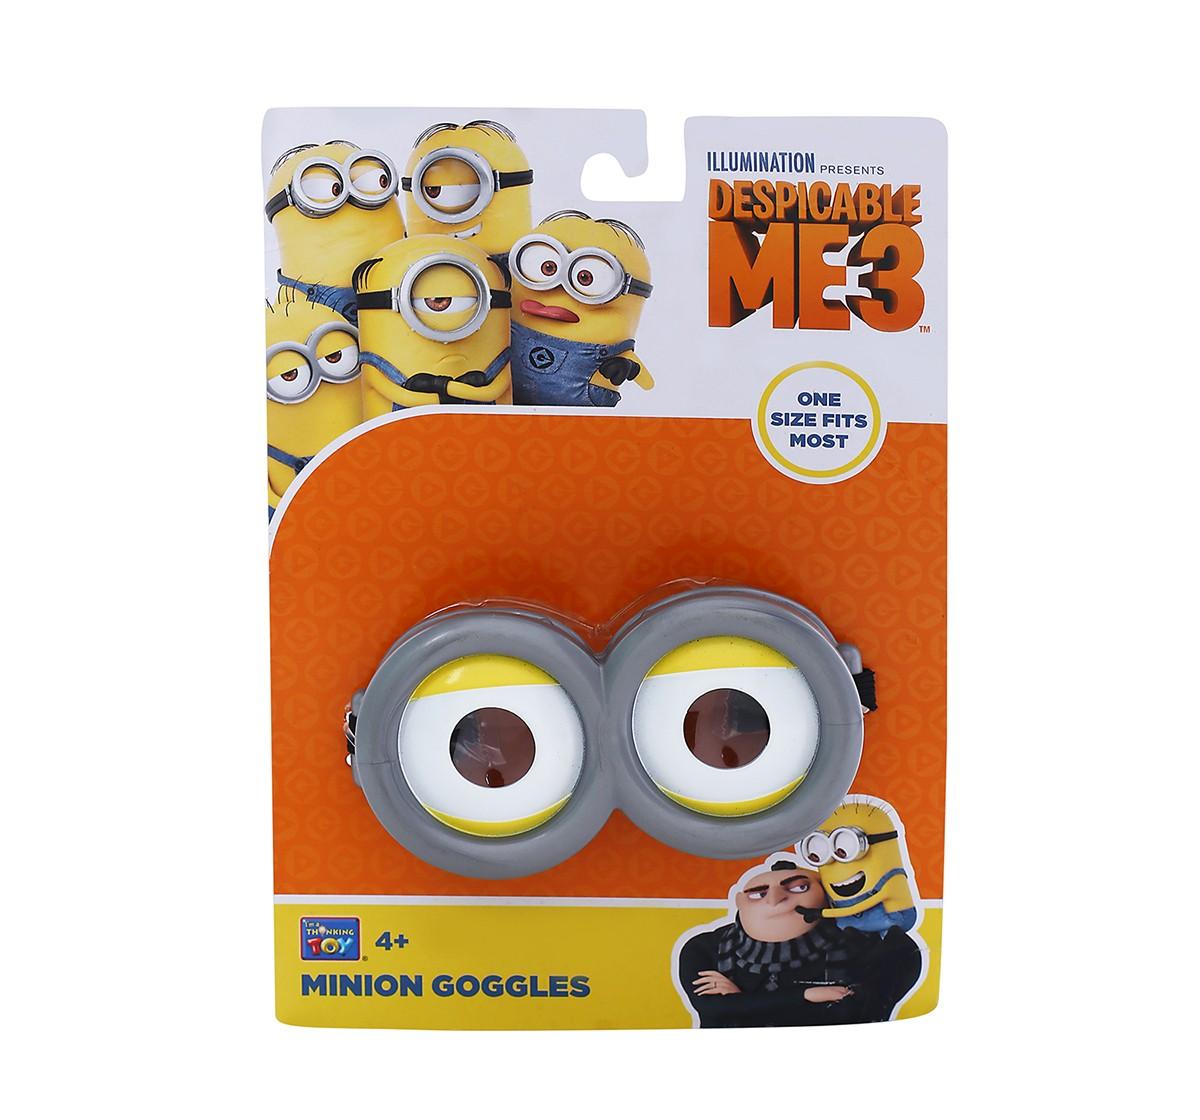 Minions Despicable Me Goggles age 4Y+